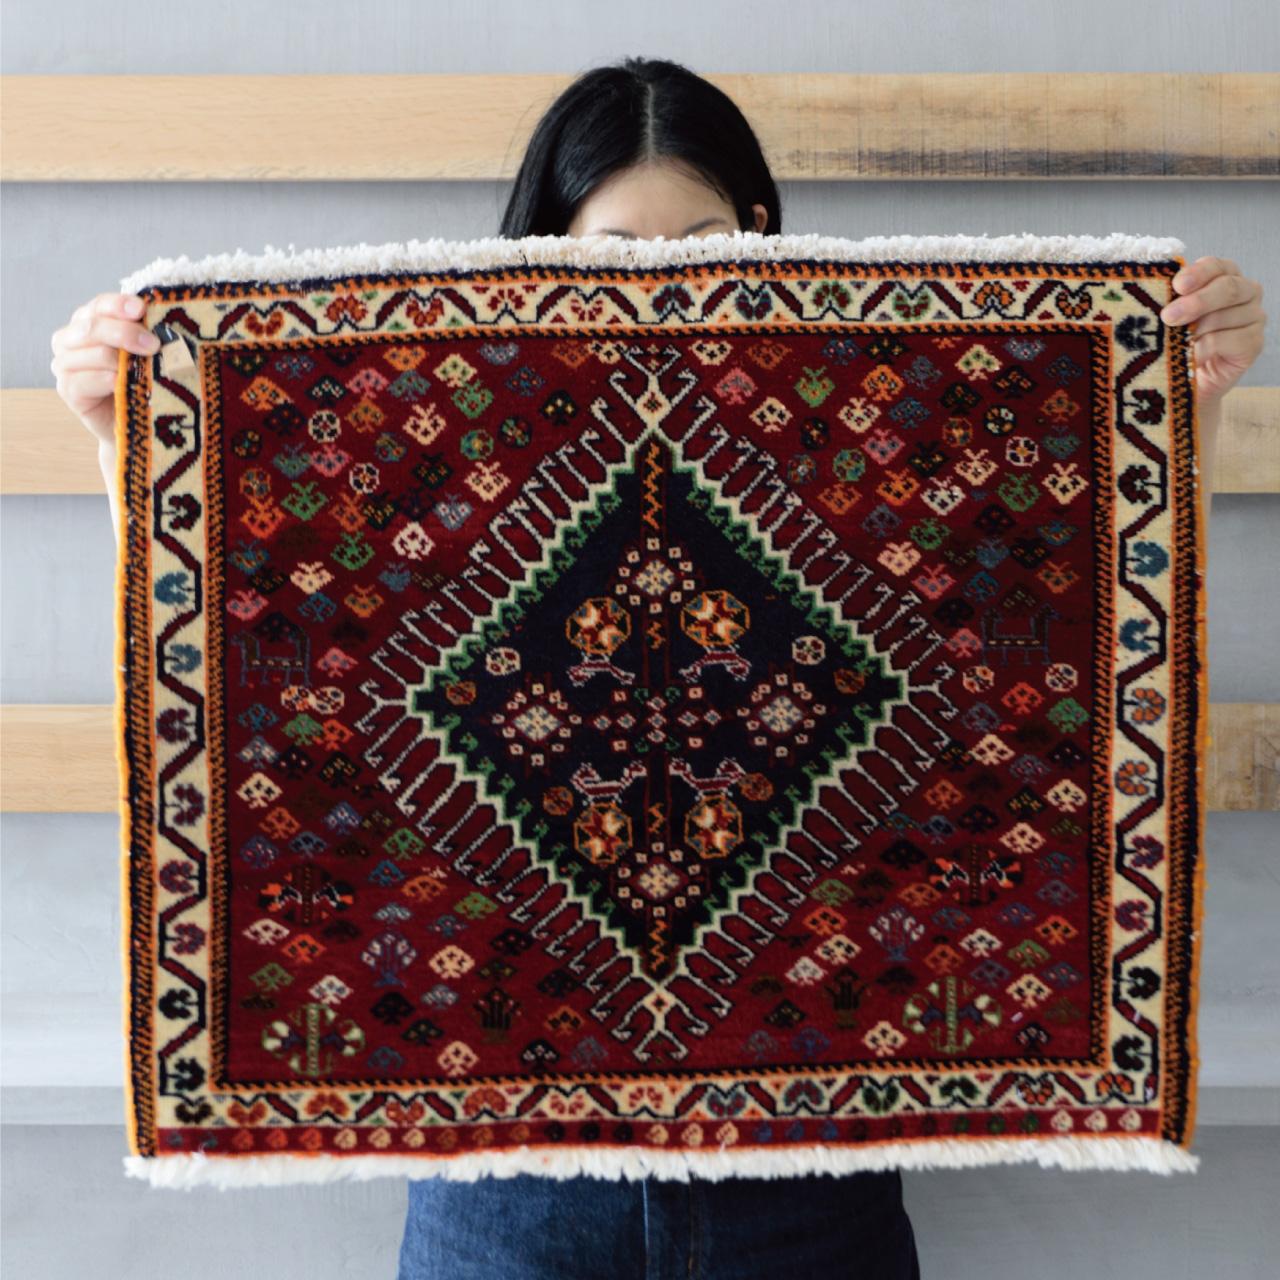 Tribal rug #71678 / 60×60cm / シラーズ族 / ¥30,000-(税別)